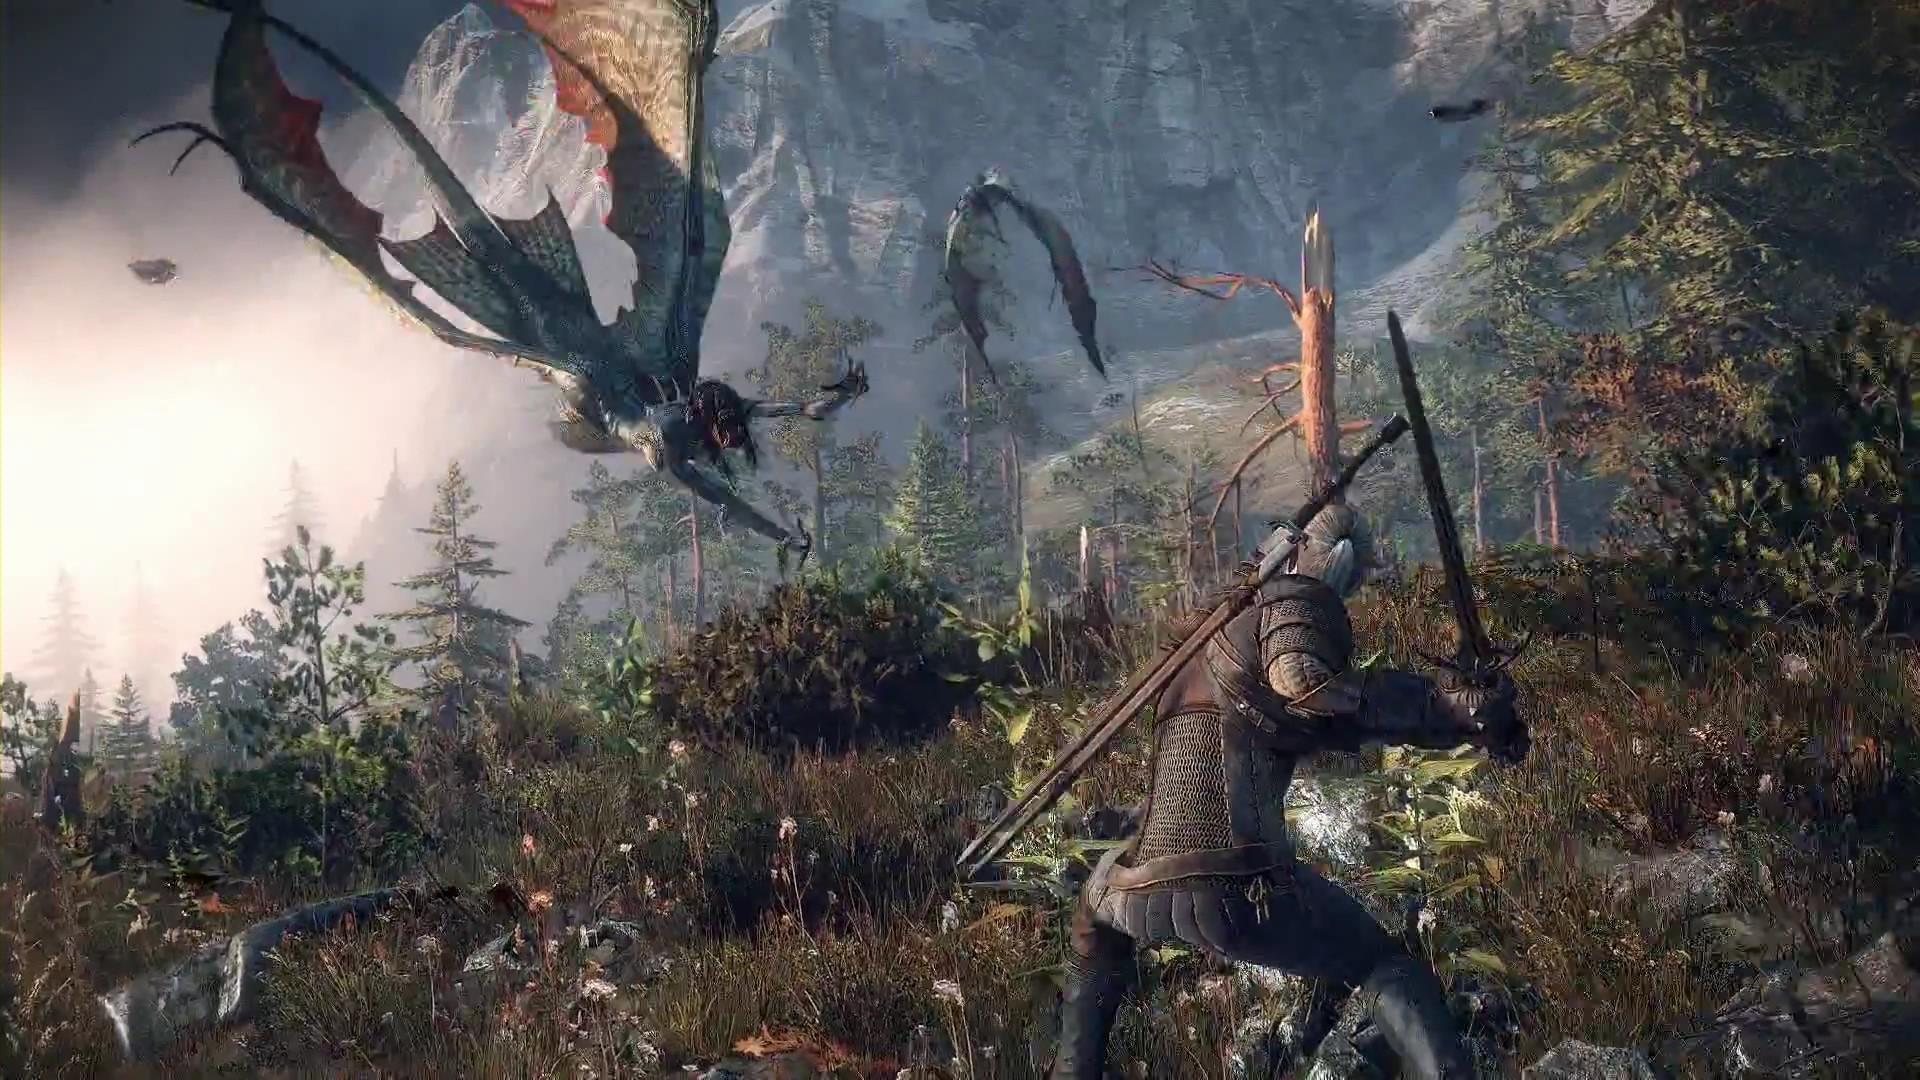 The Witcher 3: Wild Hunt Computer Wallpapers, Desktop Backgrounds .